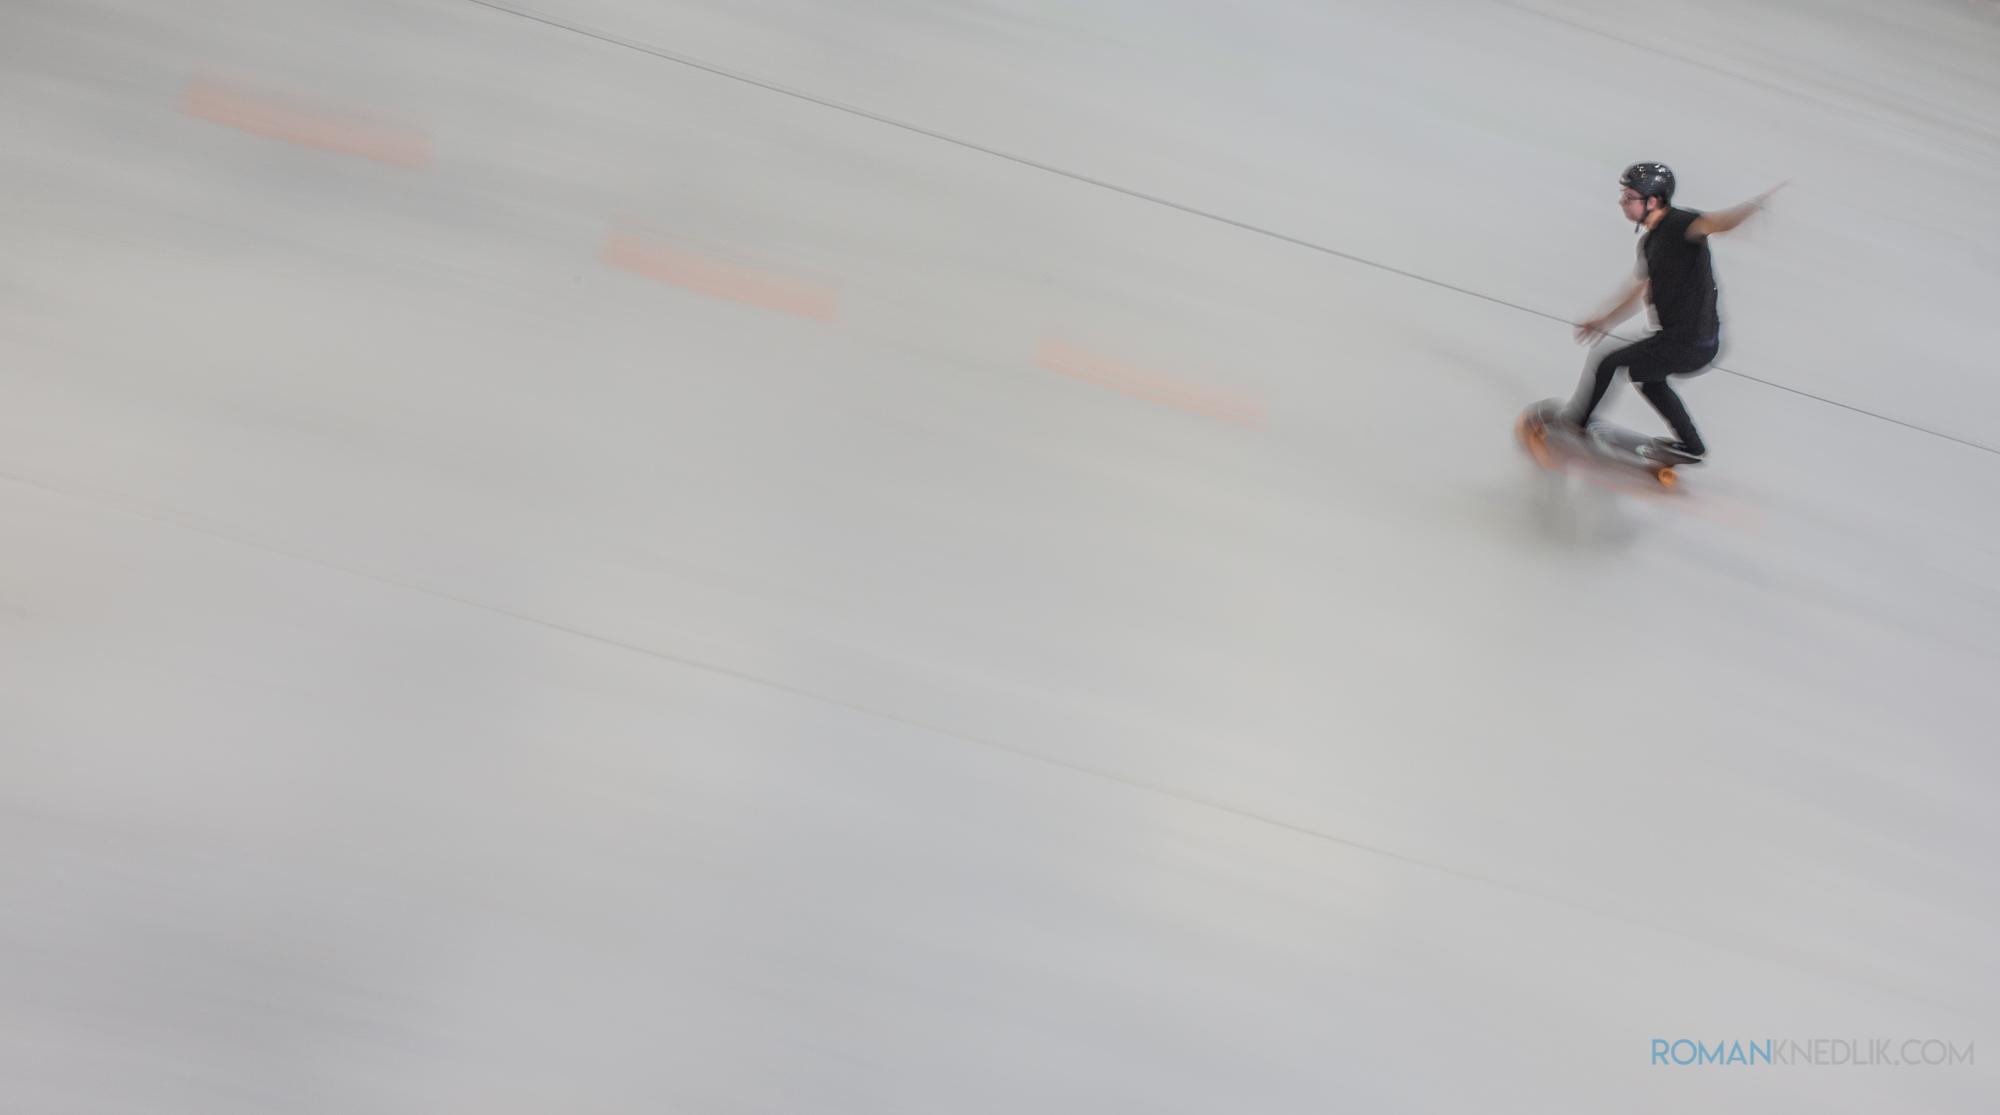 Skateslalom_indoor-16